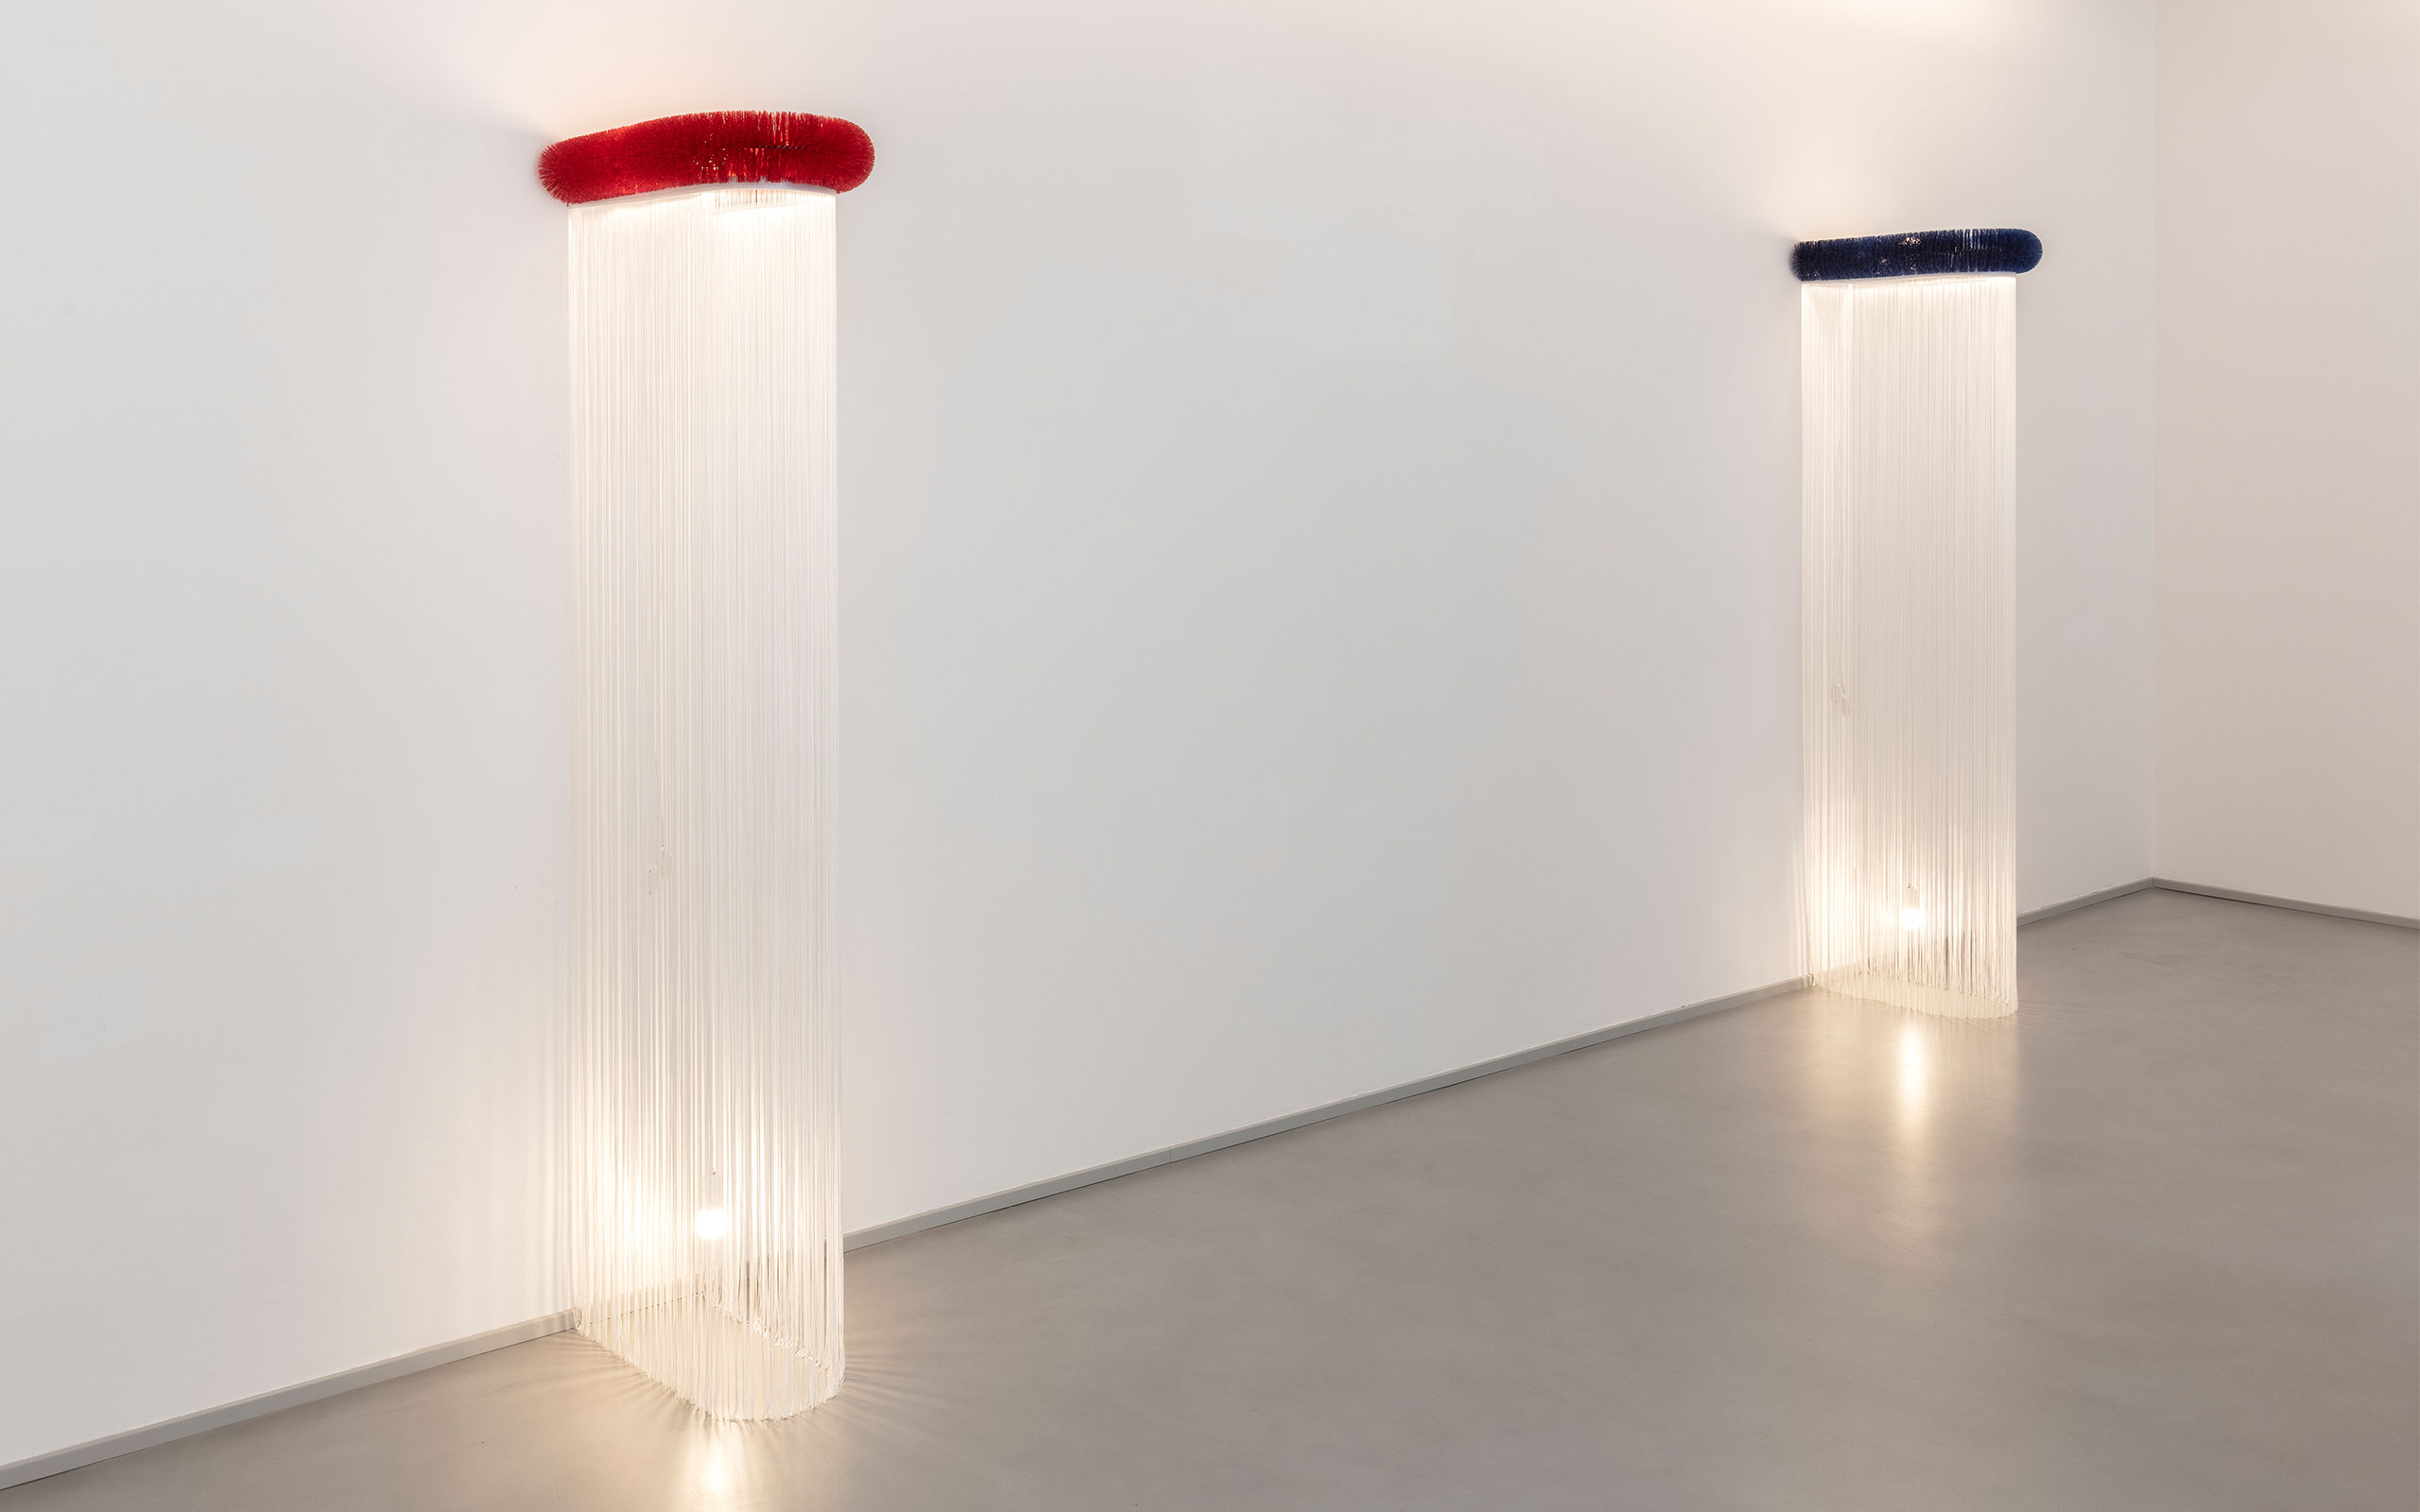 Let'em shine art wall lamp by Paola Pivi | Paradisoterrestre